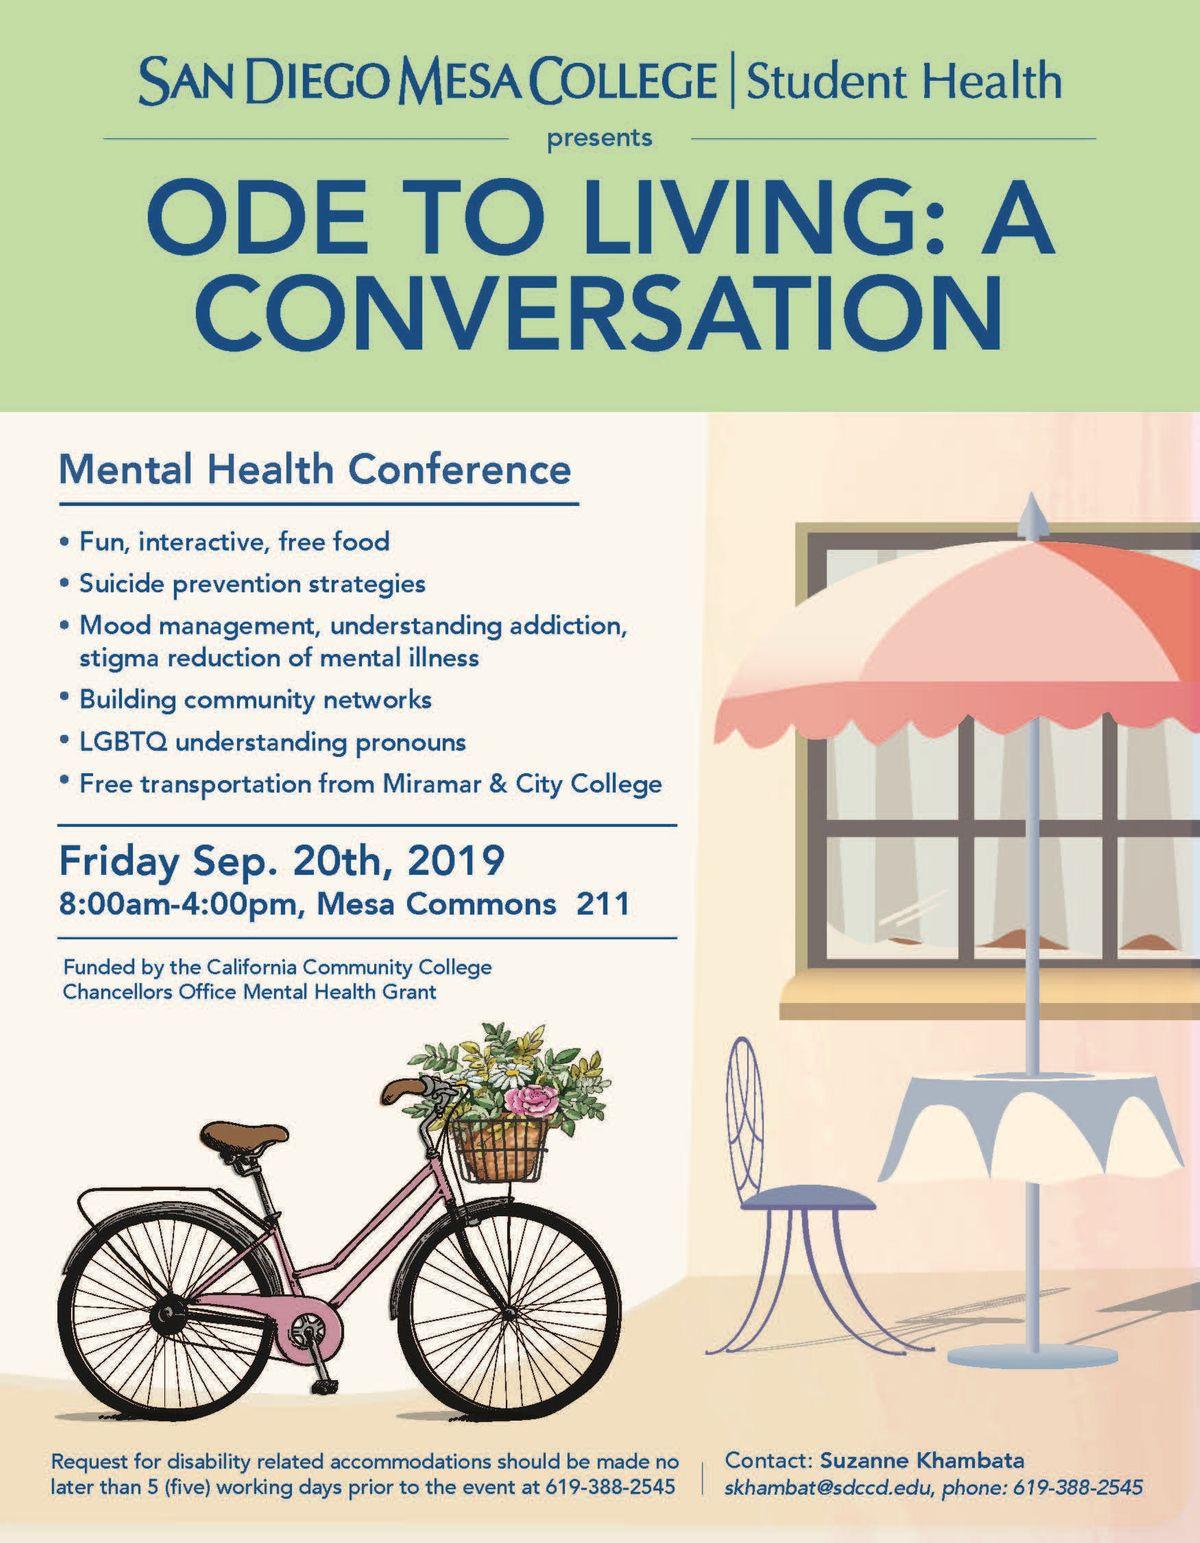 San Diego Mesa College Mental Health Confrence